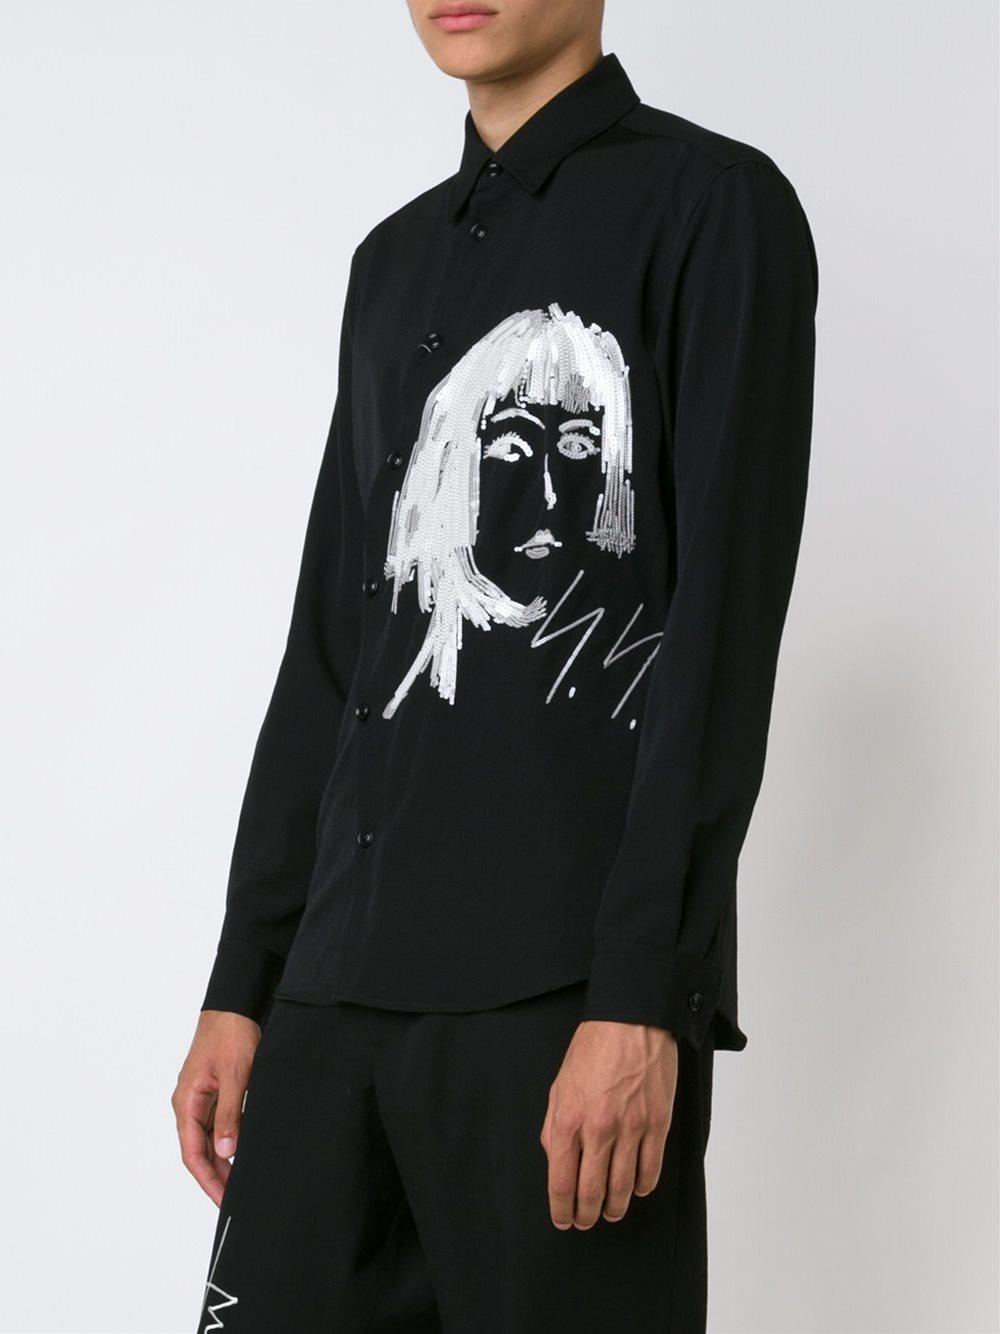 Yohji Yamamoto Spangles Shirt In Black For Men Lyst